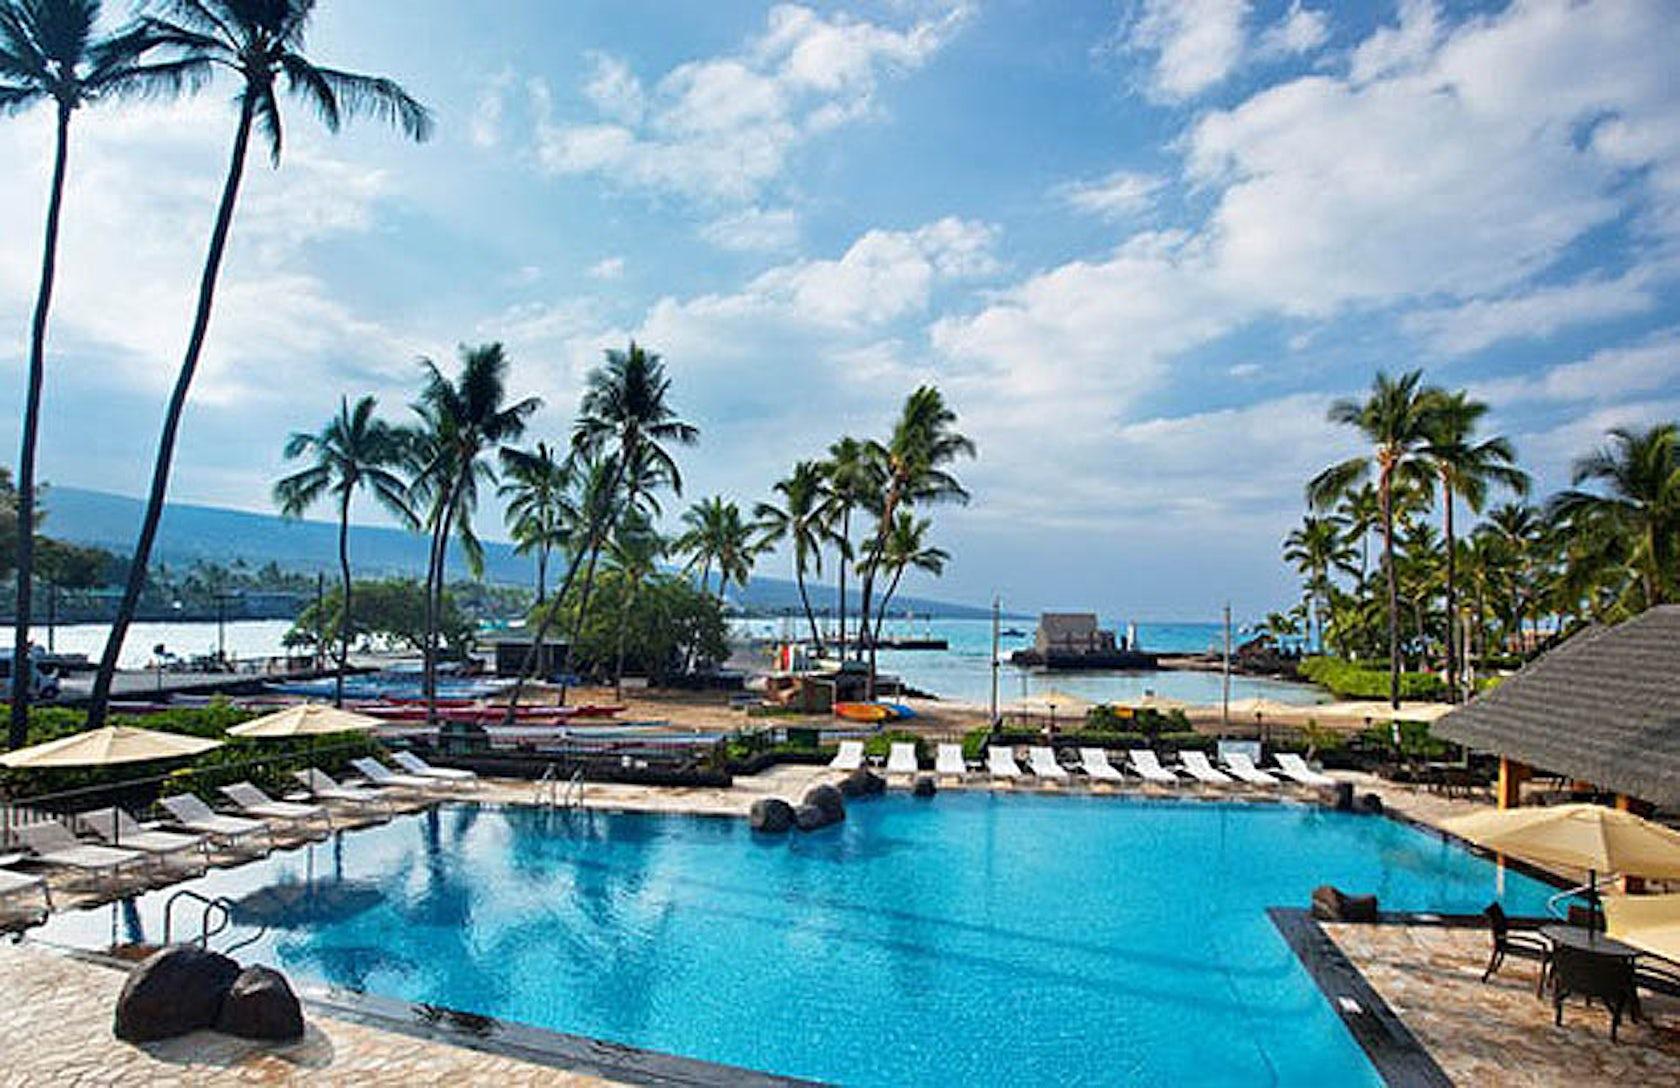 King Kamehameha S Kona Beach Hotel Architizer